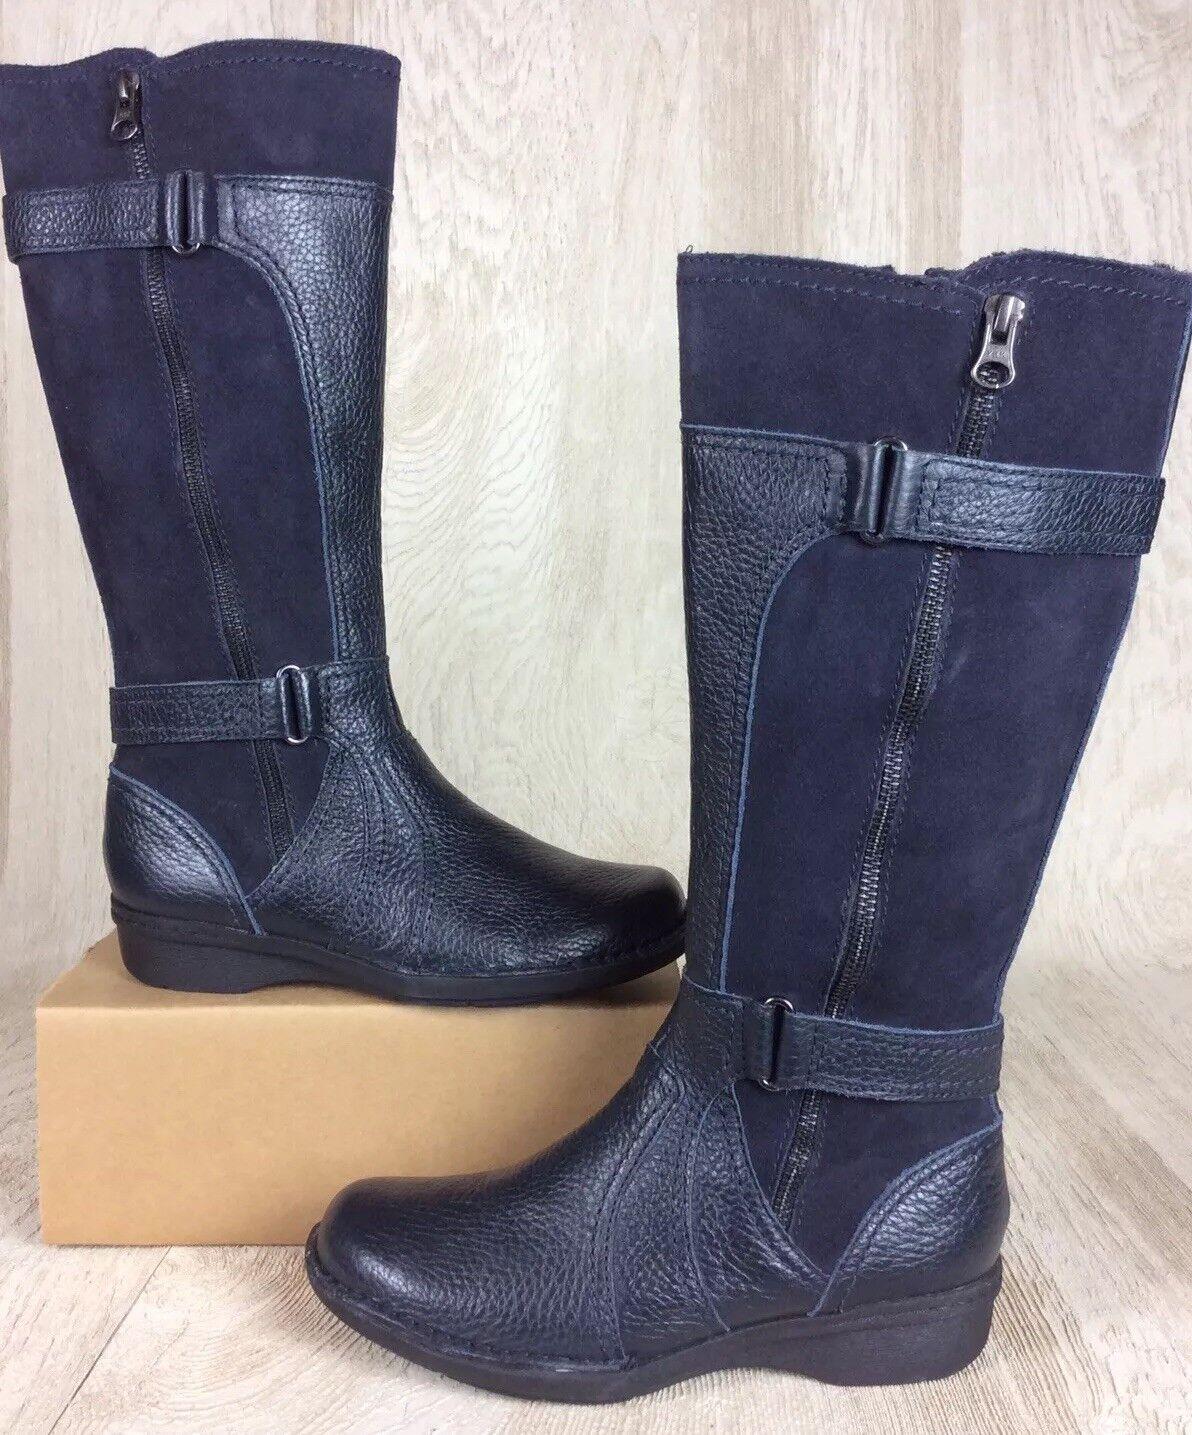 Clarks Leather Medium Calf bottes - Whistle Whey Navy 5.5 Medium NEW